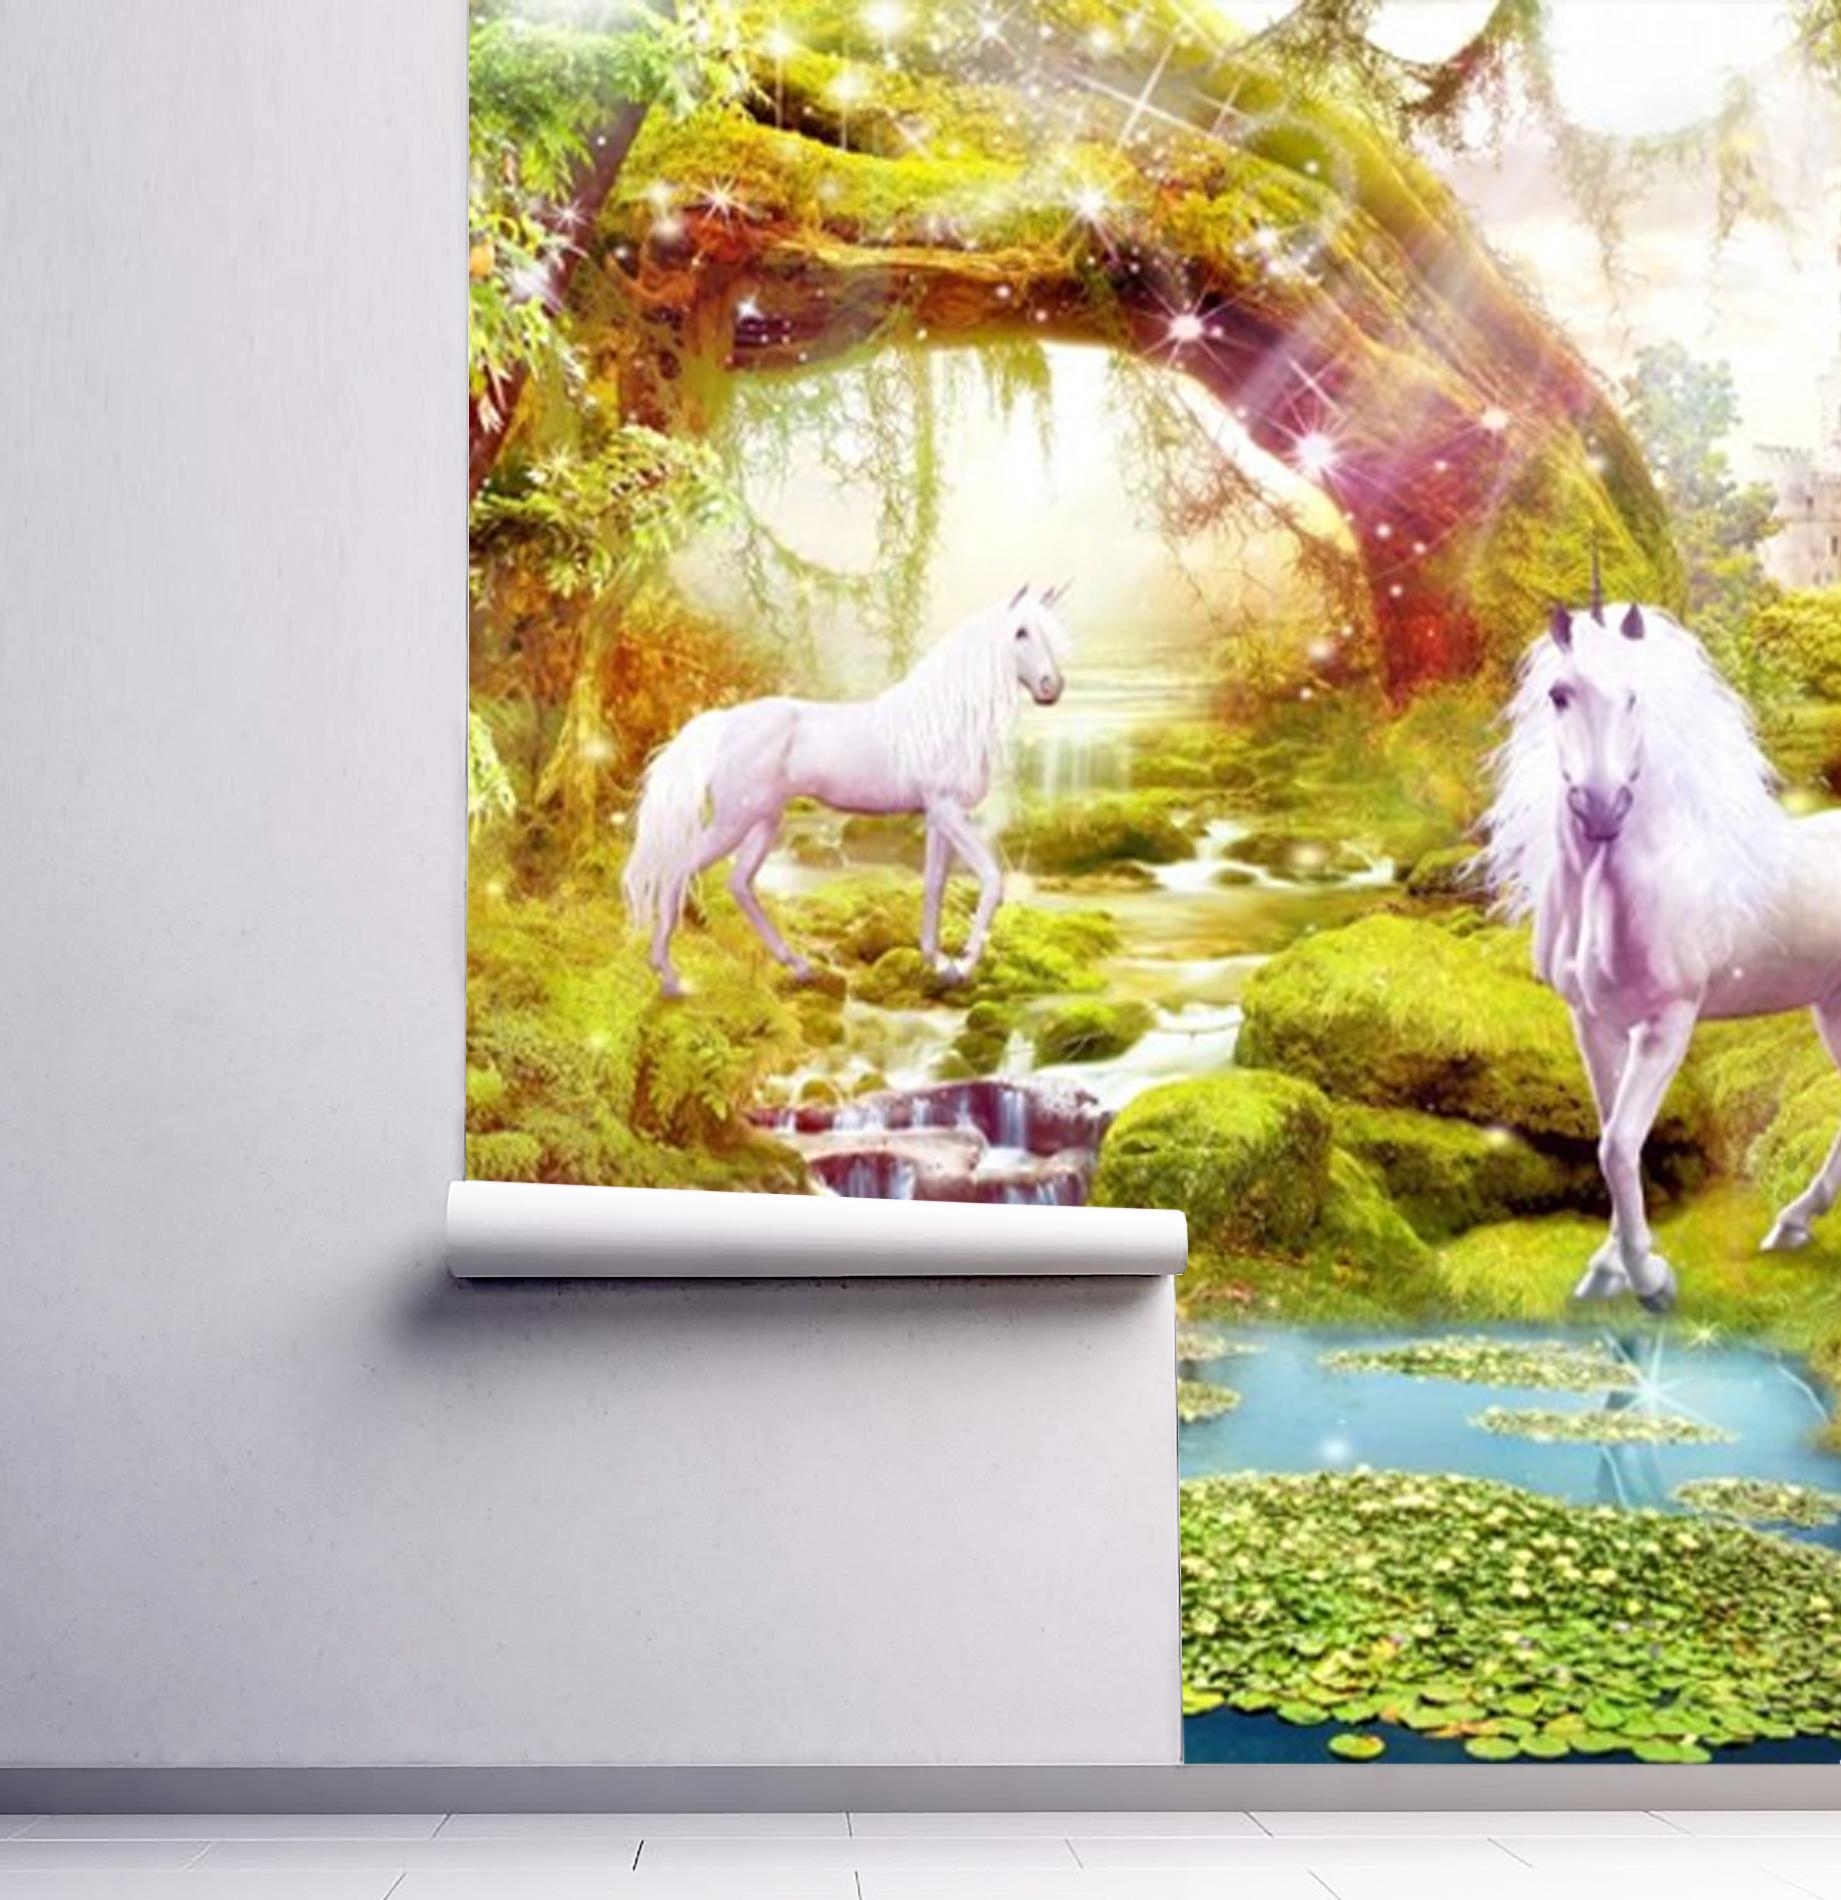 Wallpaper Art Unicorn Magical Forest Nursery Magic Tree Fairytale Forest Gorgeous Large Adhesive Vinyl